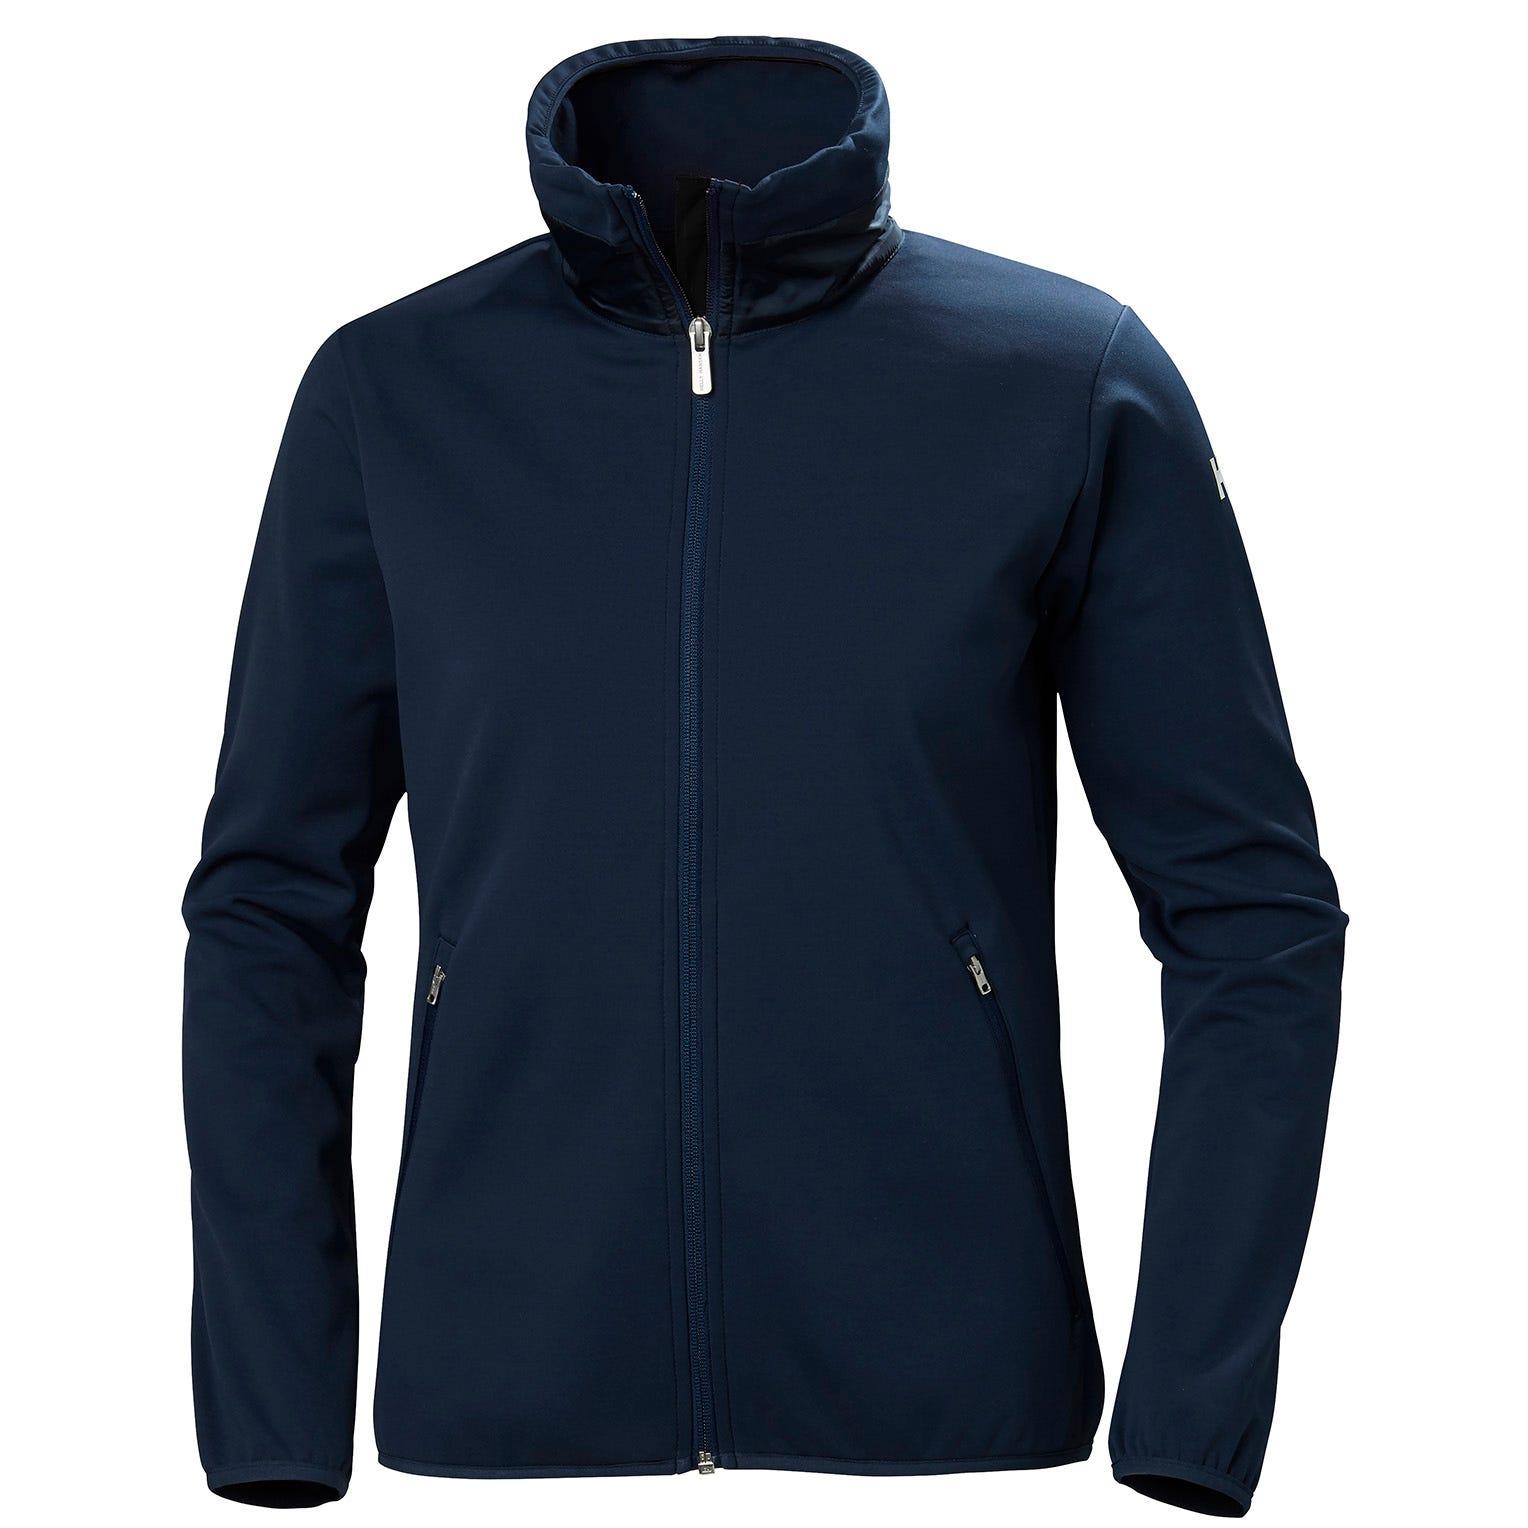 Helly Hansen Womens Naiad Warm Fleece Jacket Navy S